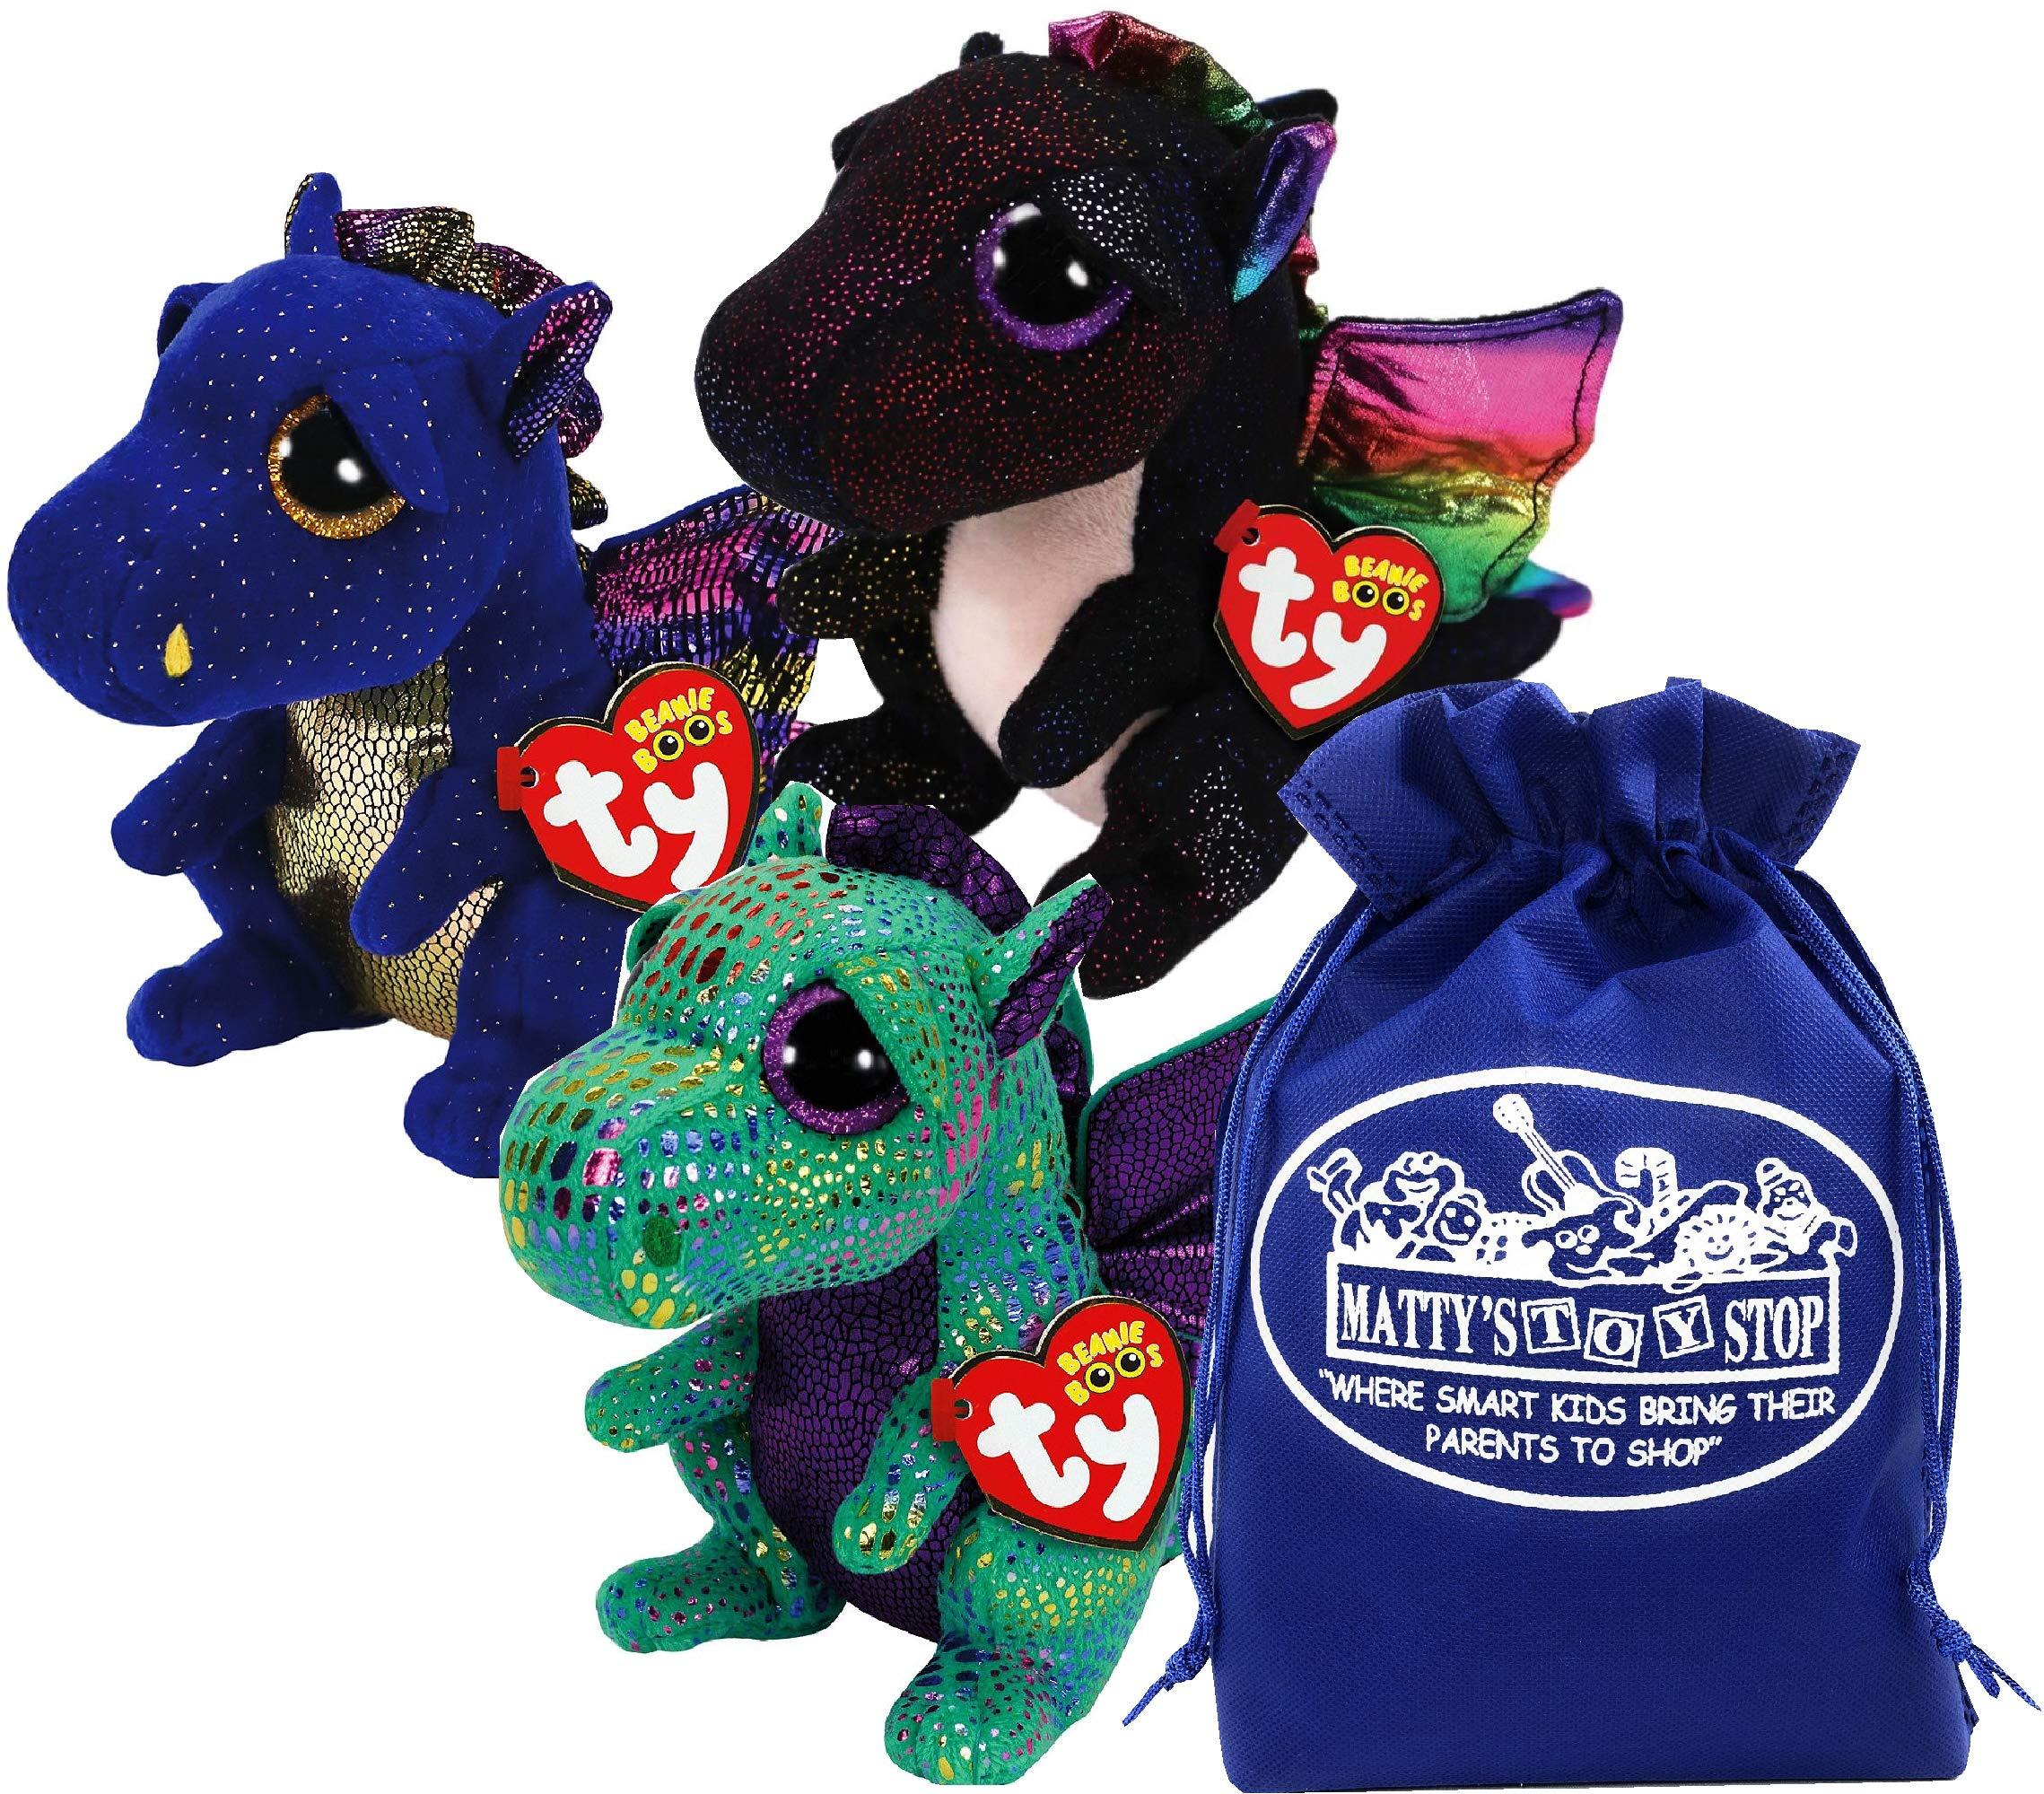 Ty Beanie Boos ''Dragons Saffire (Blue Dragon), Cinder (Green Dragon) & Anora (Black Dragon) Gift Set Bundle with Bonus Matty's Toy Stop Storage Bag - 3 Pack by Ty Beanie Boos